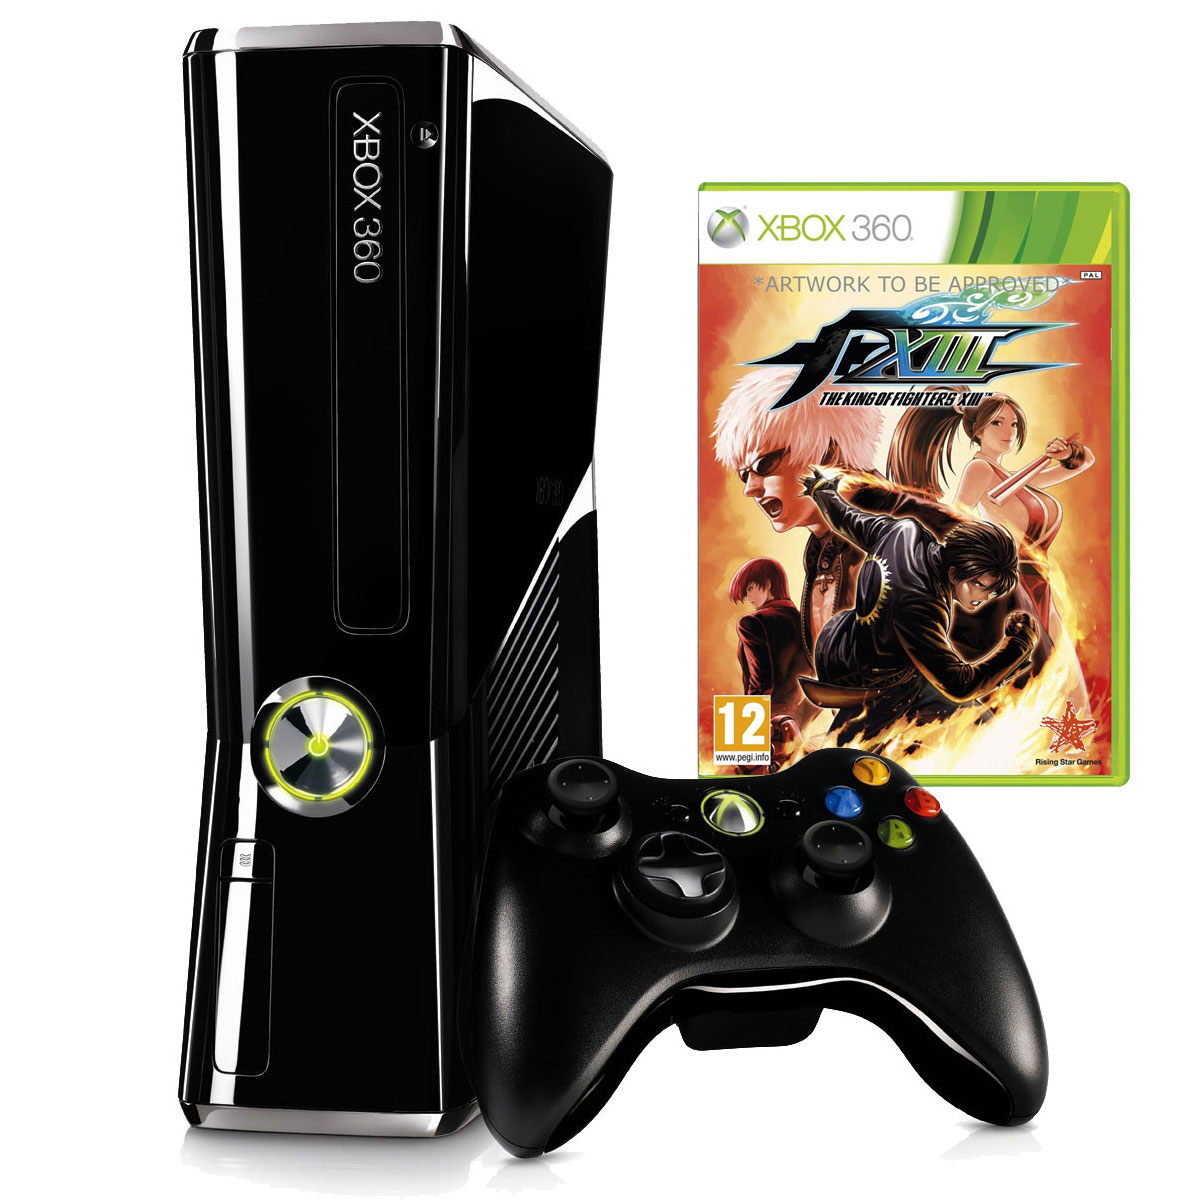 Console de jeux Microsoft Xbox 360 Slim 250 Go + King Of Fighters XIII Microsoft Xbox 360  + King Of Fighters XIII